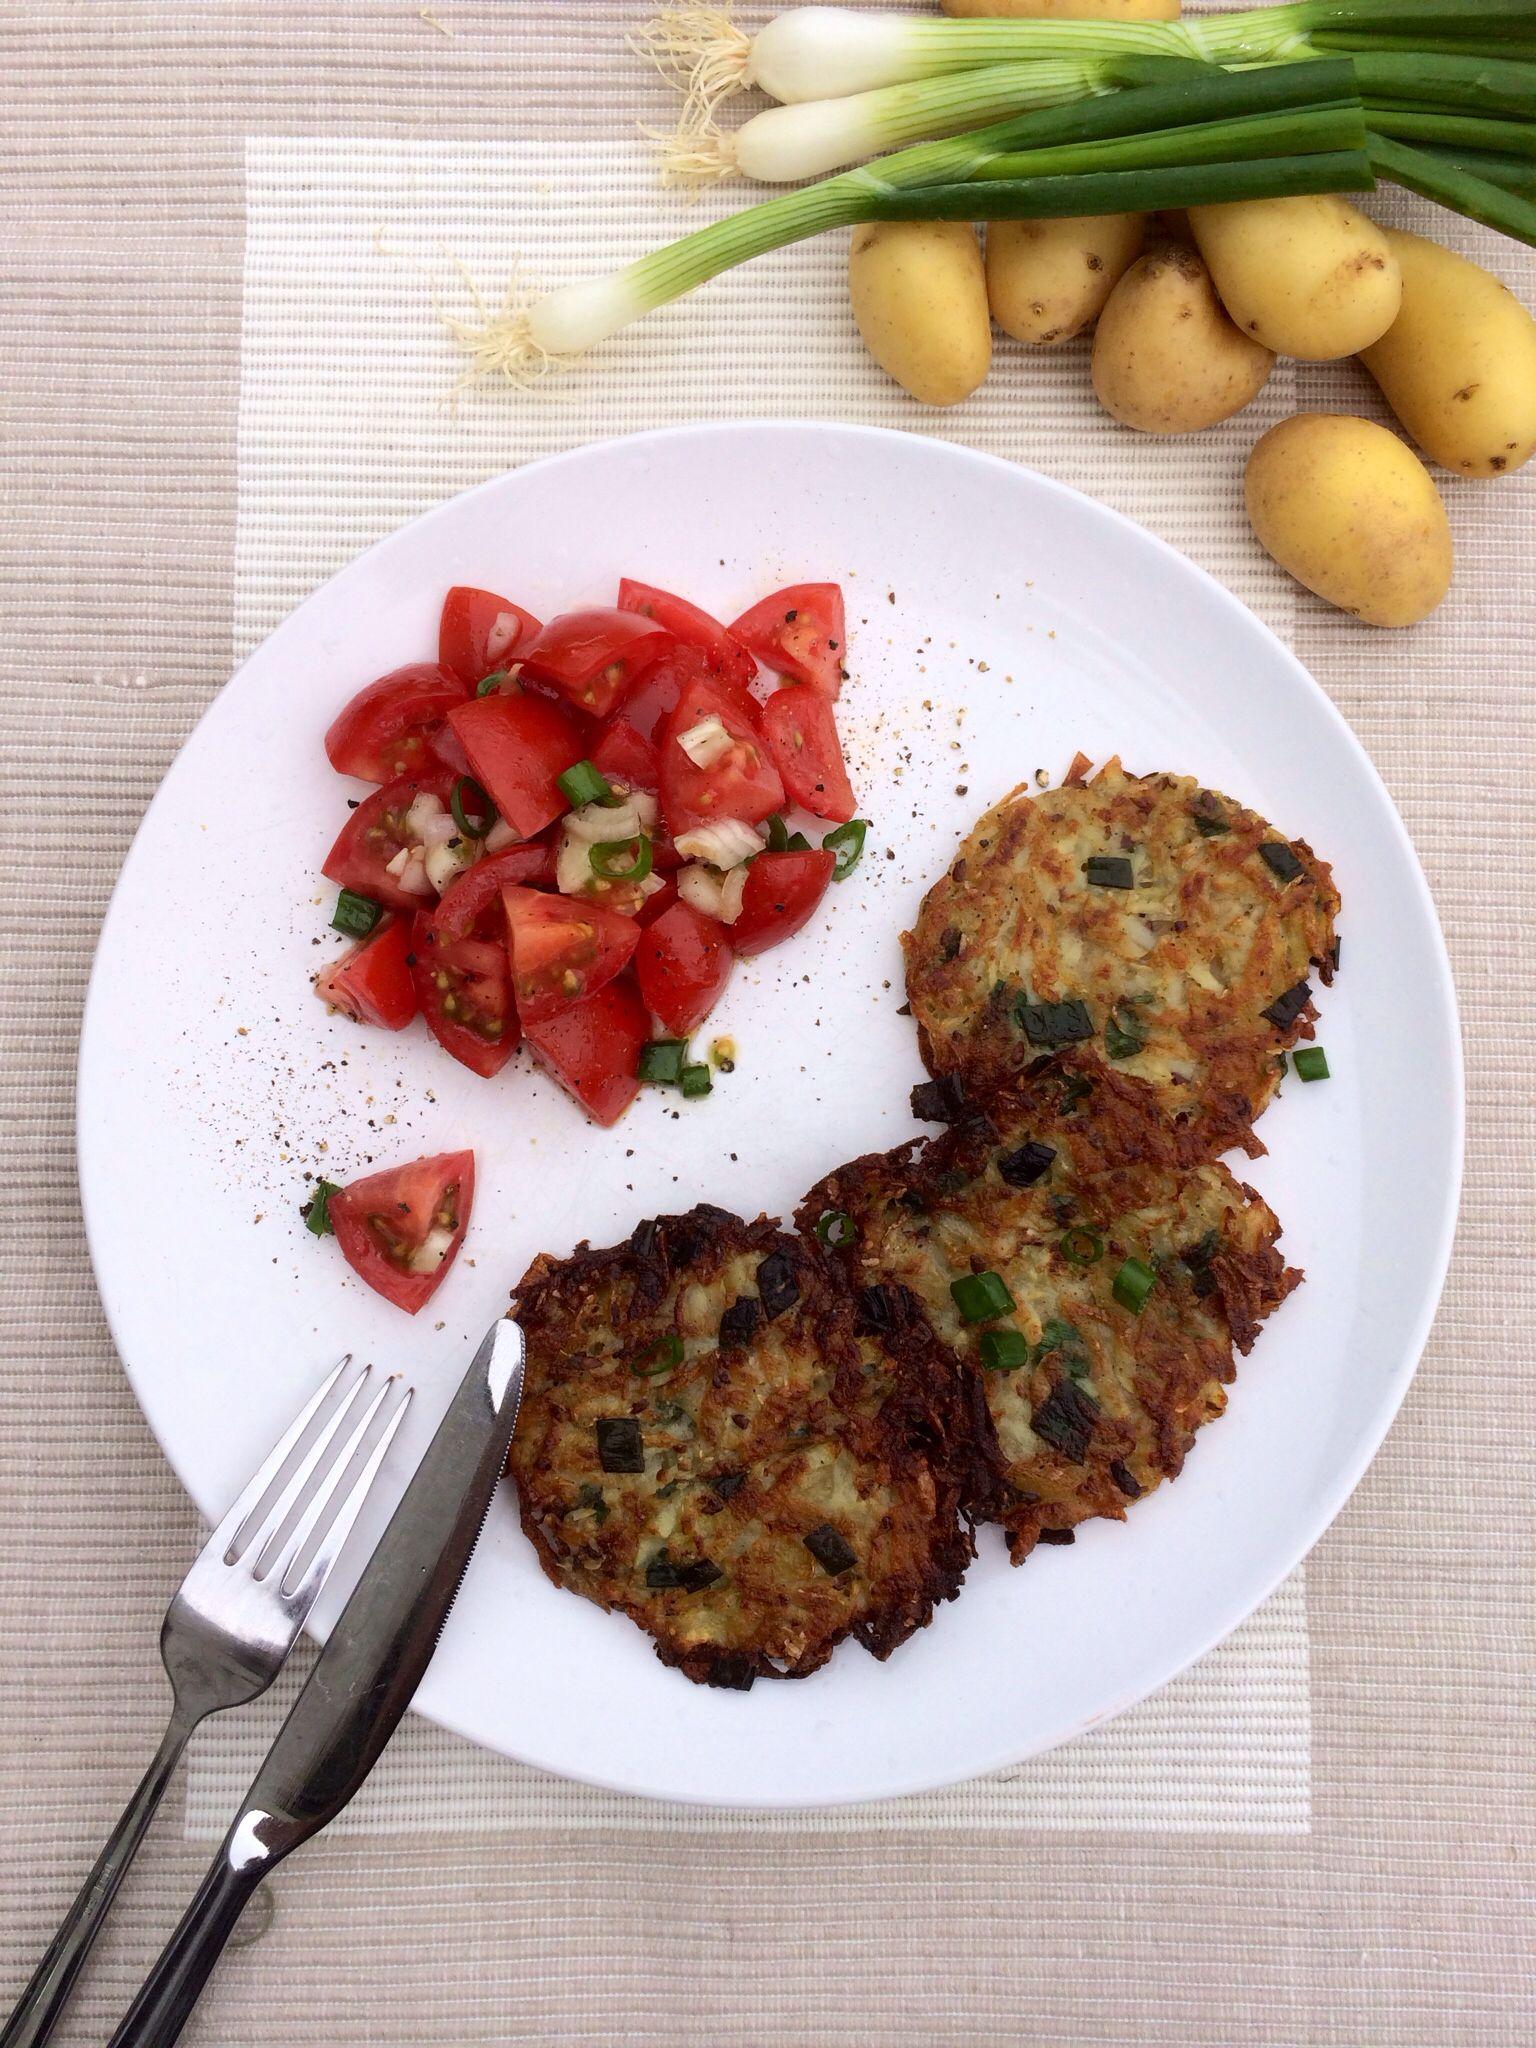 Potato pancakes with onion-leeks and tomato salad